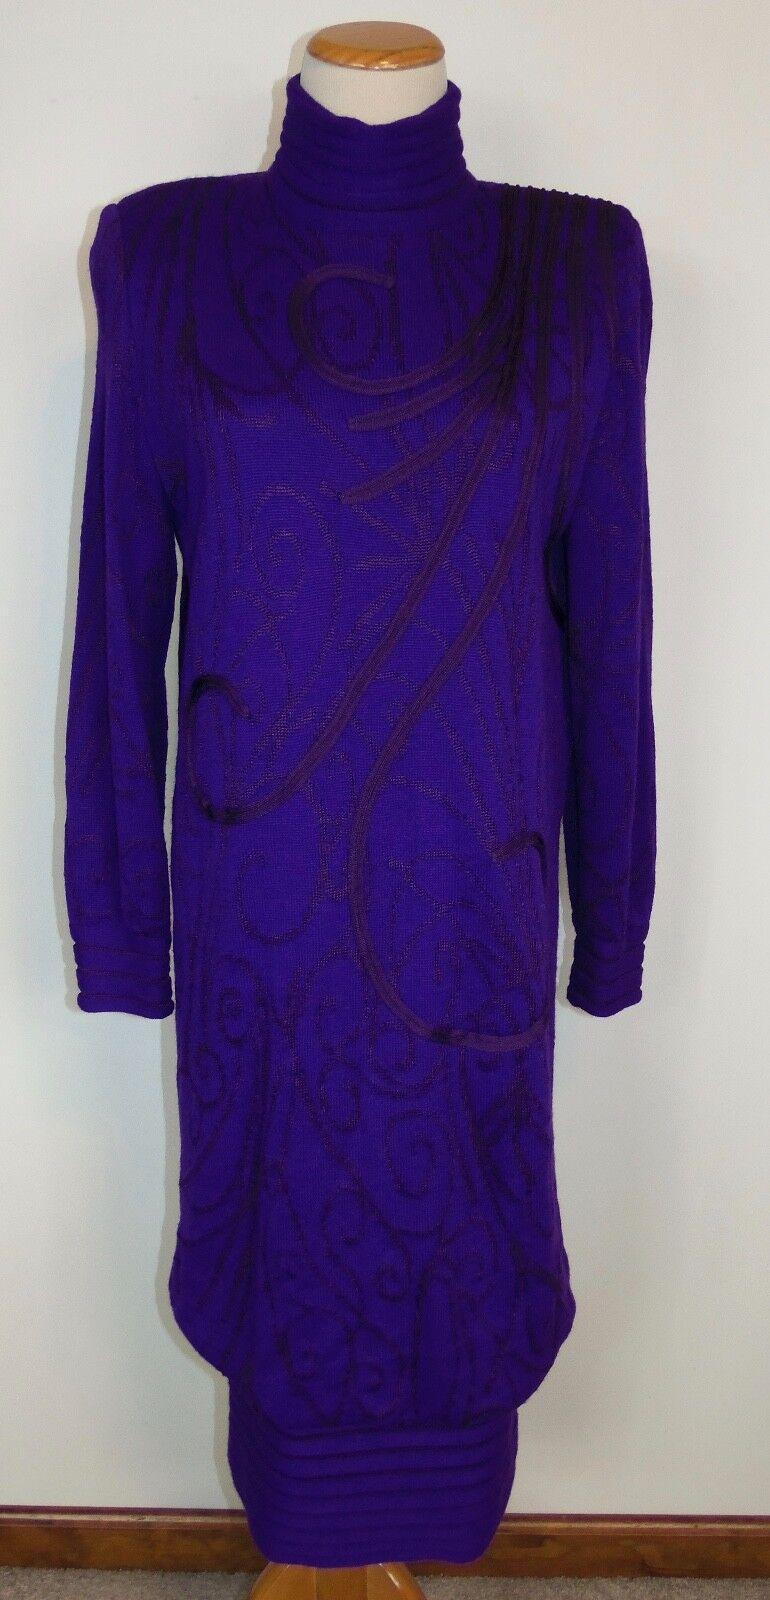 Medici Sweater Dress Sz 8 Purple Wool Blend Vtg Gill Harvey Made in